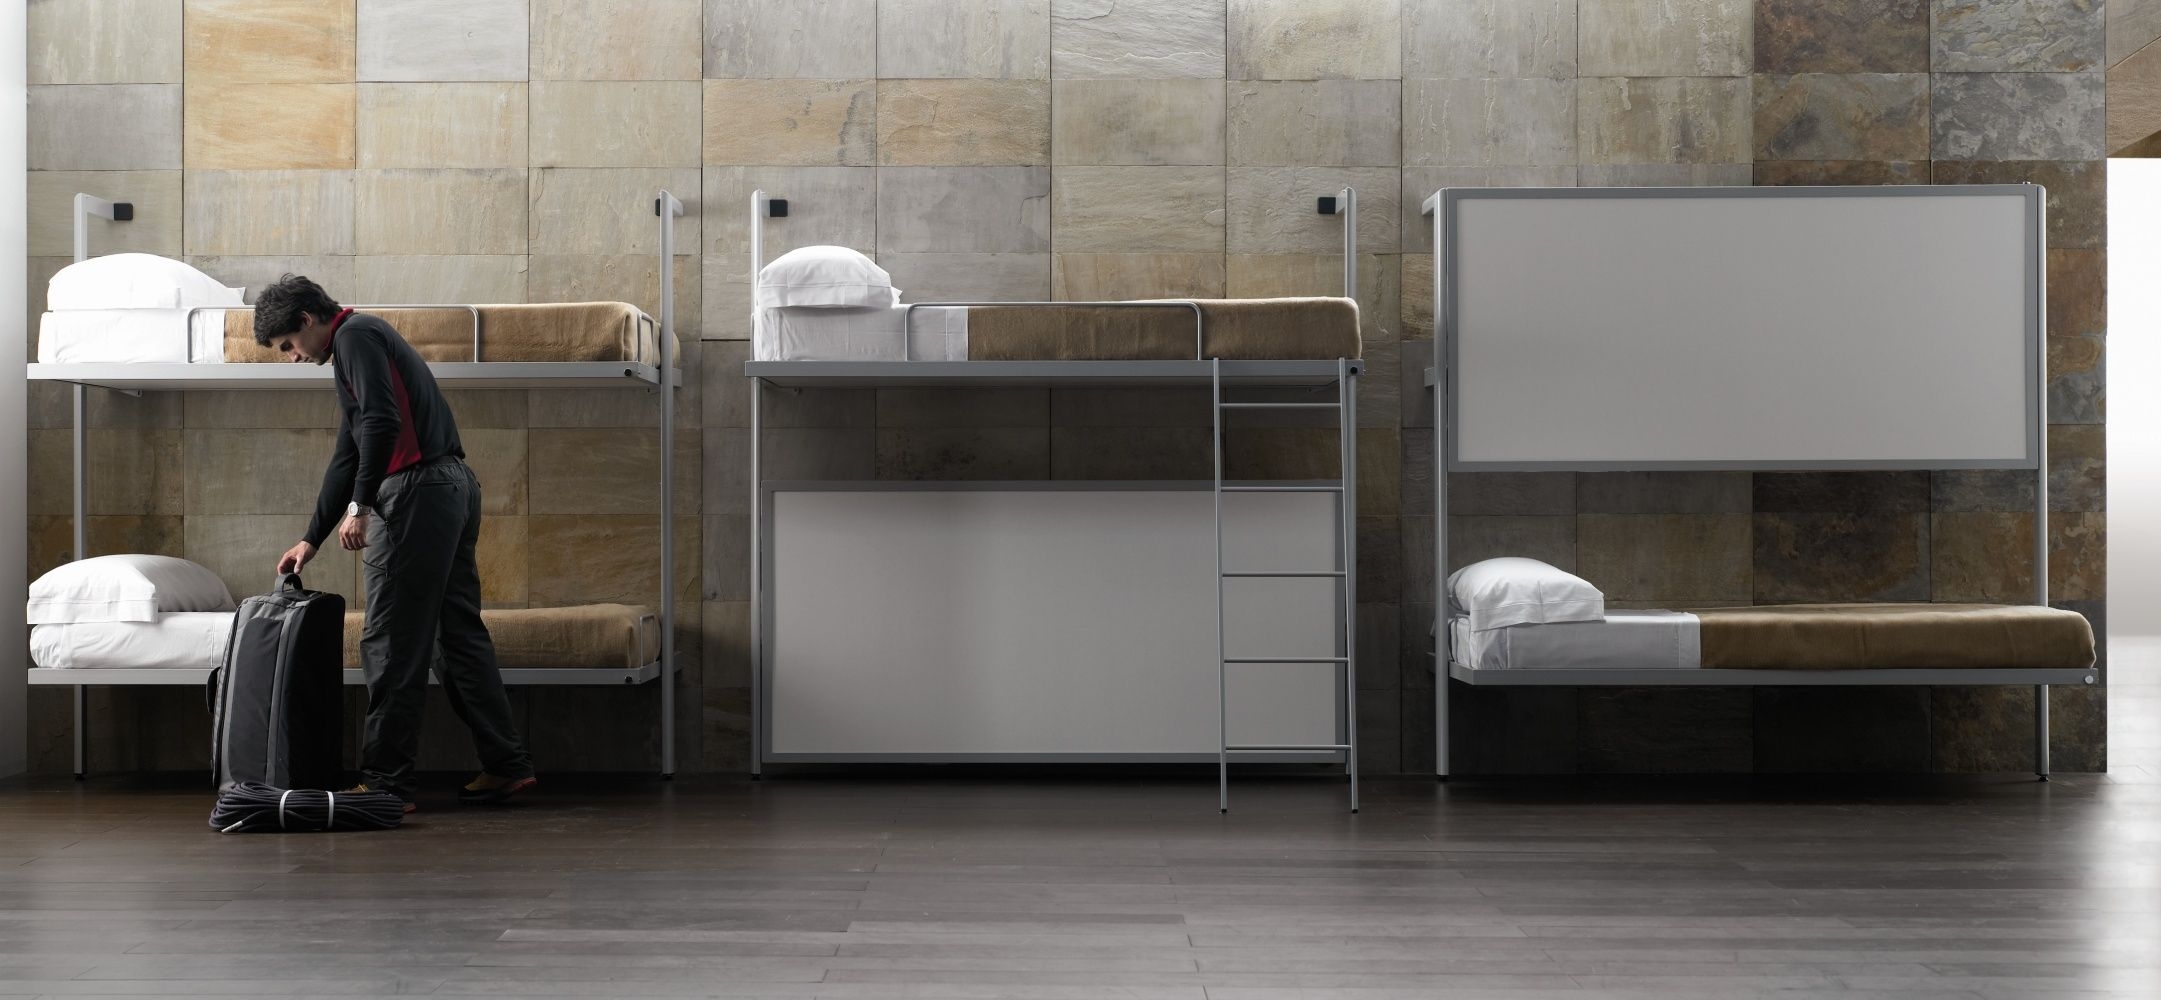 Wall Mounted Folding Bunk Beds Http Bottomunion Com Pinterest